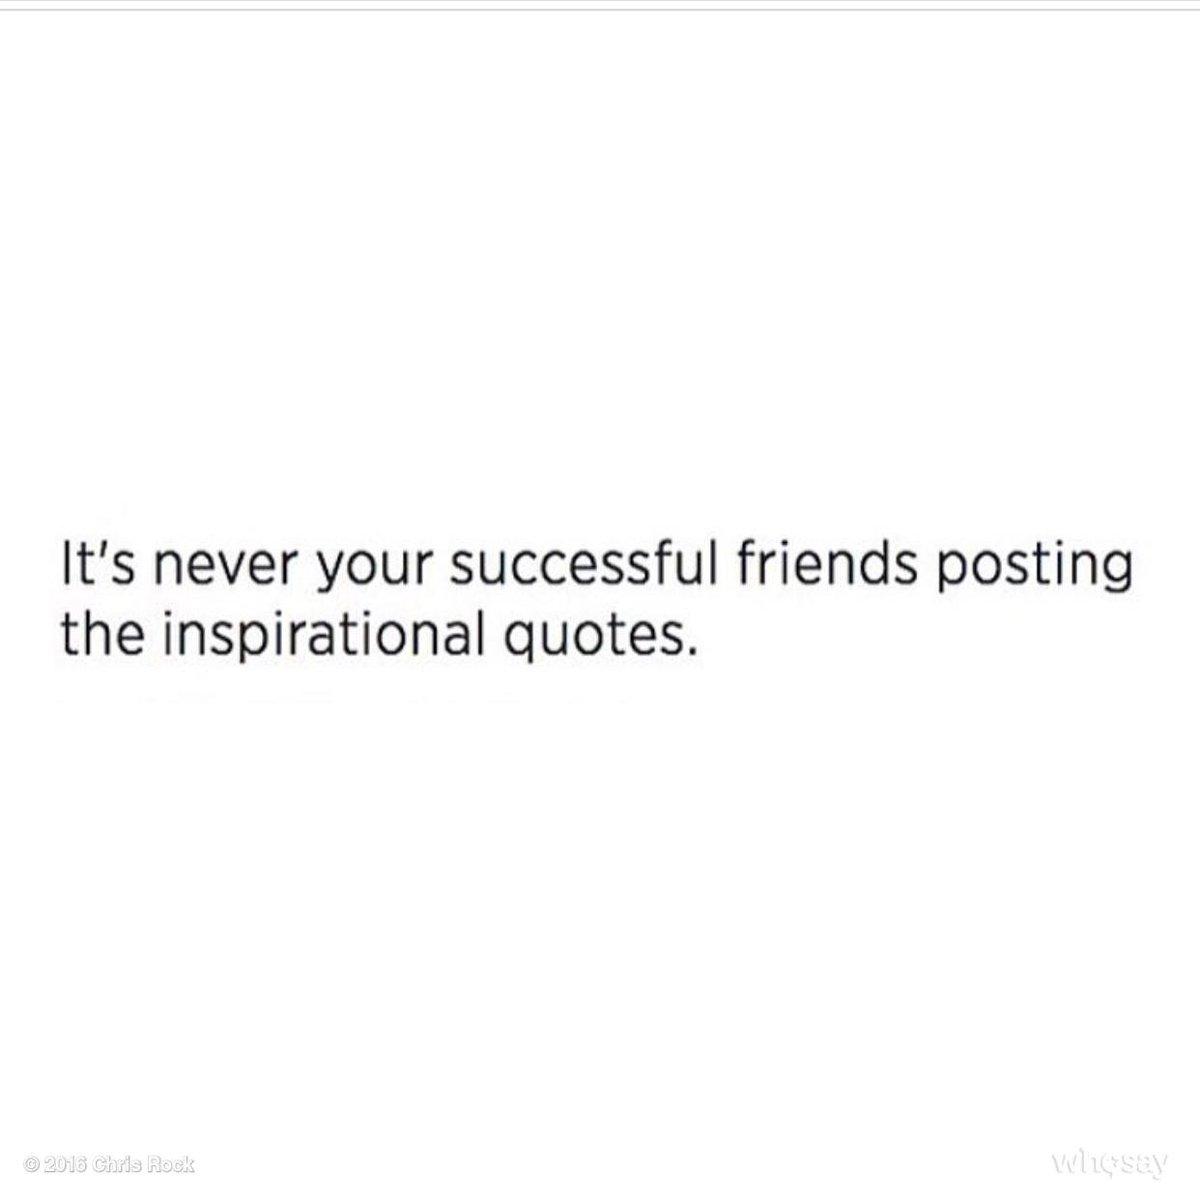 Chris Rock On Twitter